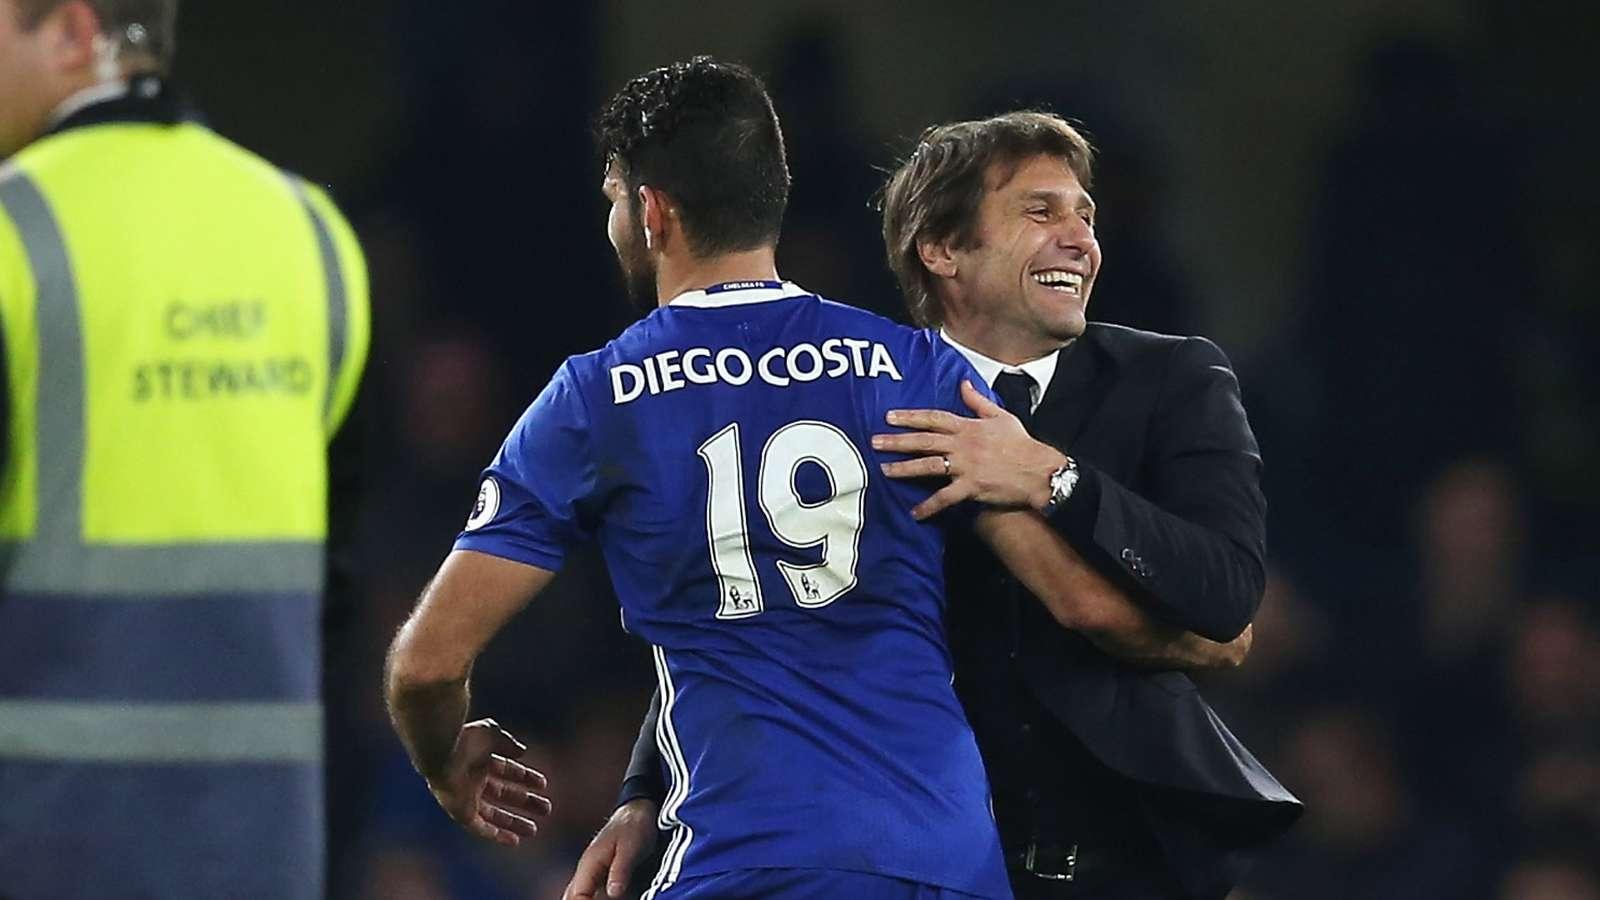 Diego Costa: Antonio Conte Tak Akan Sanggup Latih Real Madrid Semusim